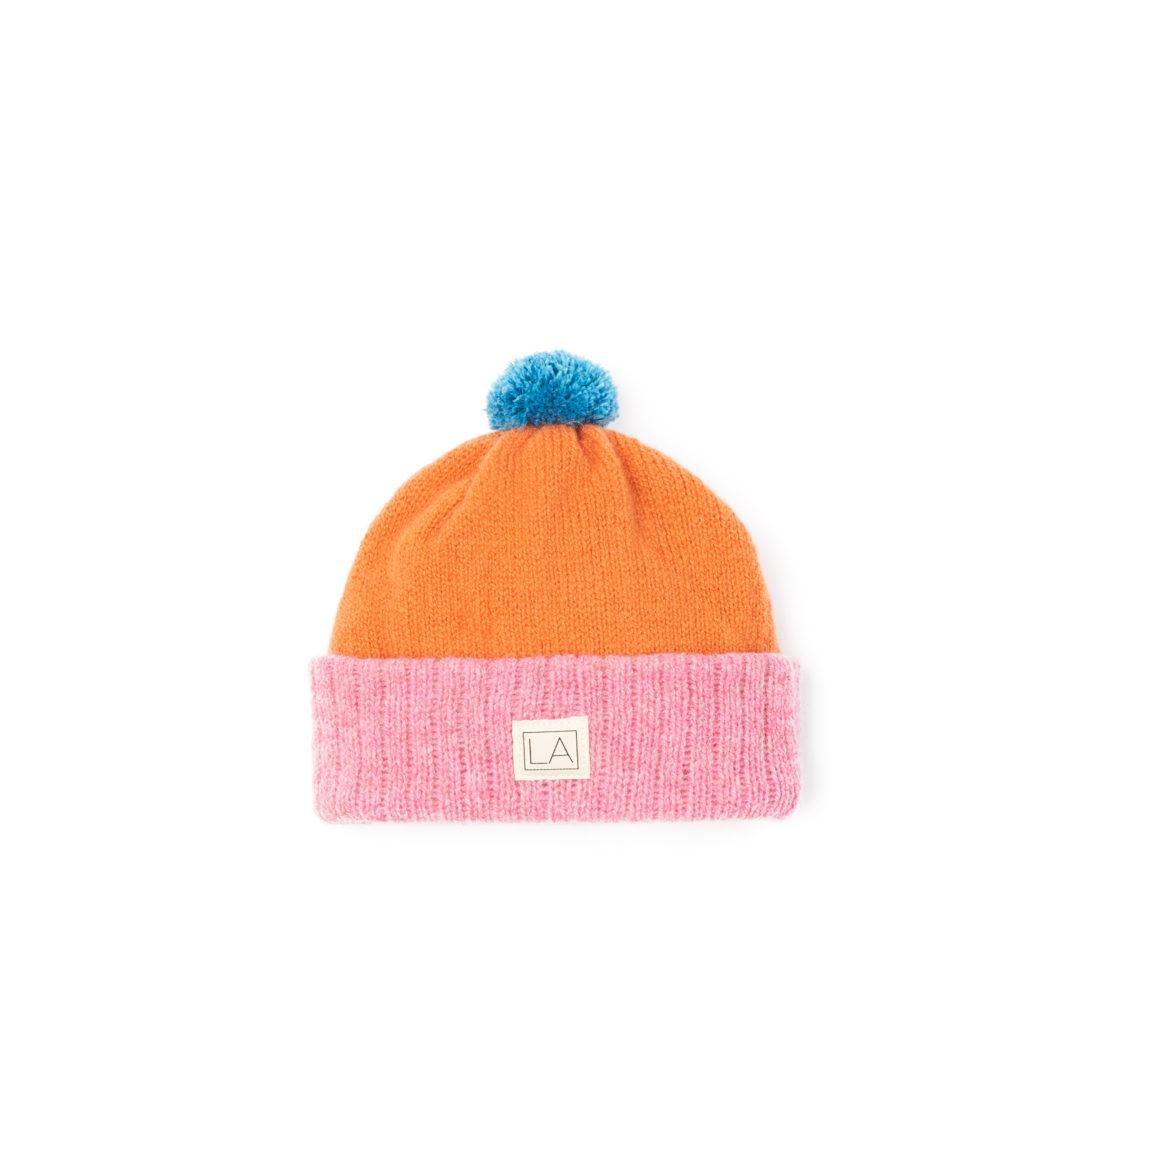 Sustainable kids hat Pink Orange Blue Beanie 315f0a8f108